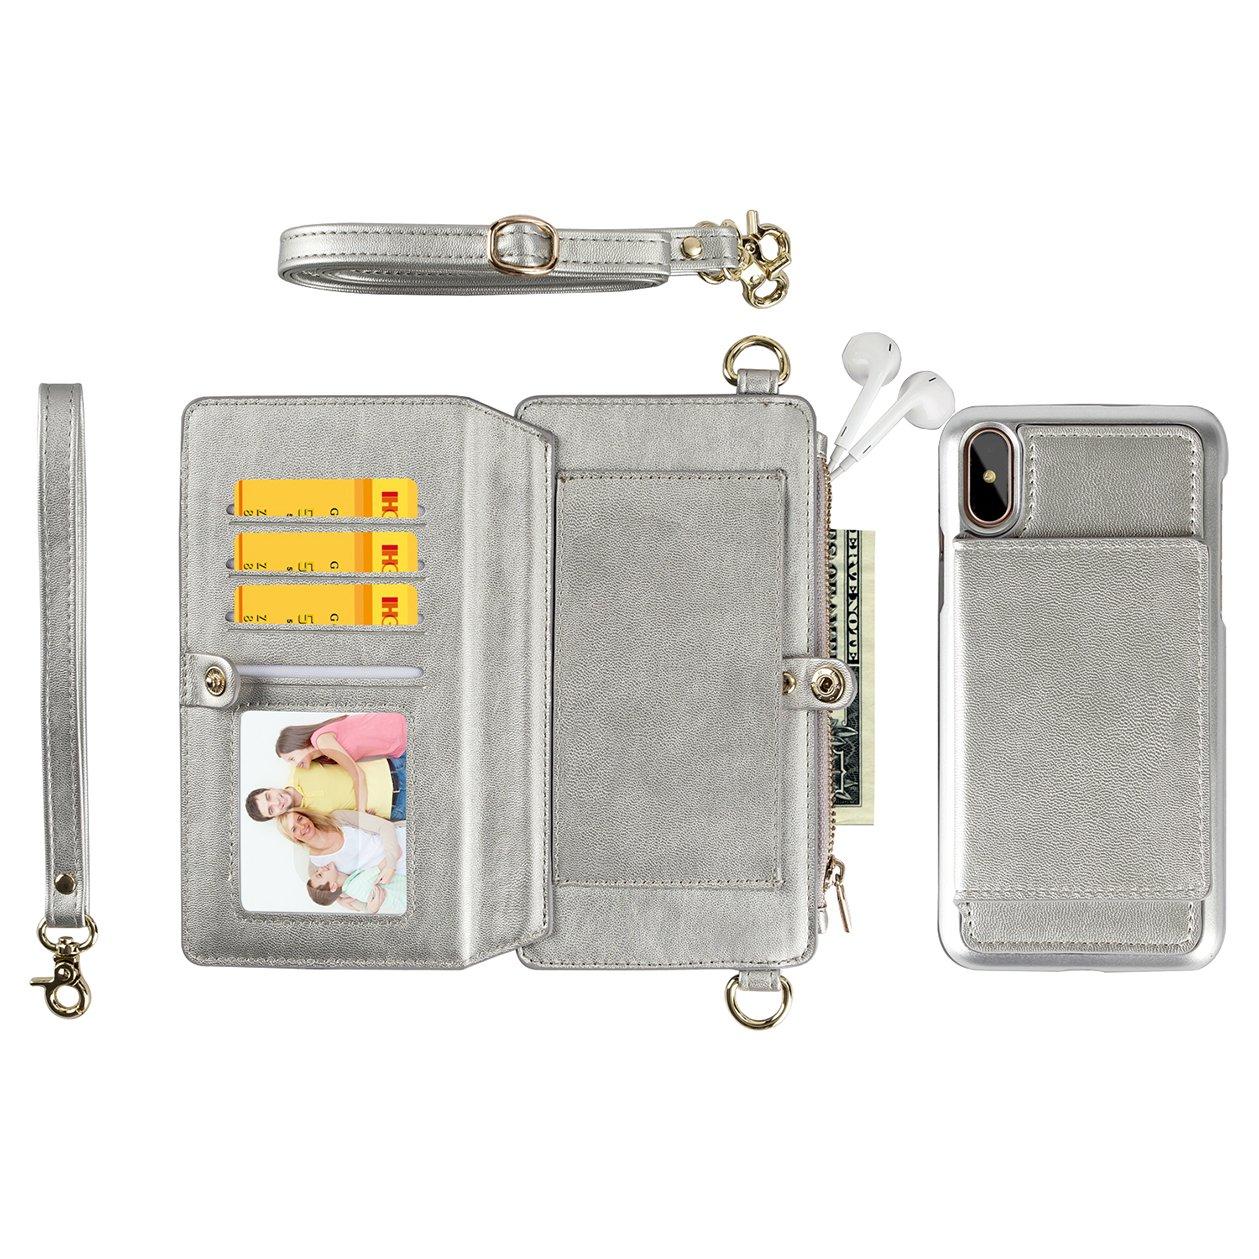 galaxy S9 case(Silver)Leather Zipper Wallet Case Fashion Card Slot Cash Slot